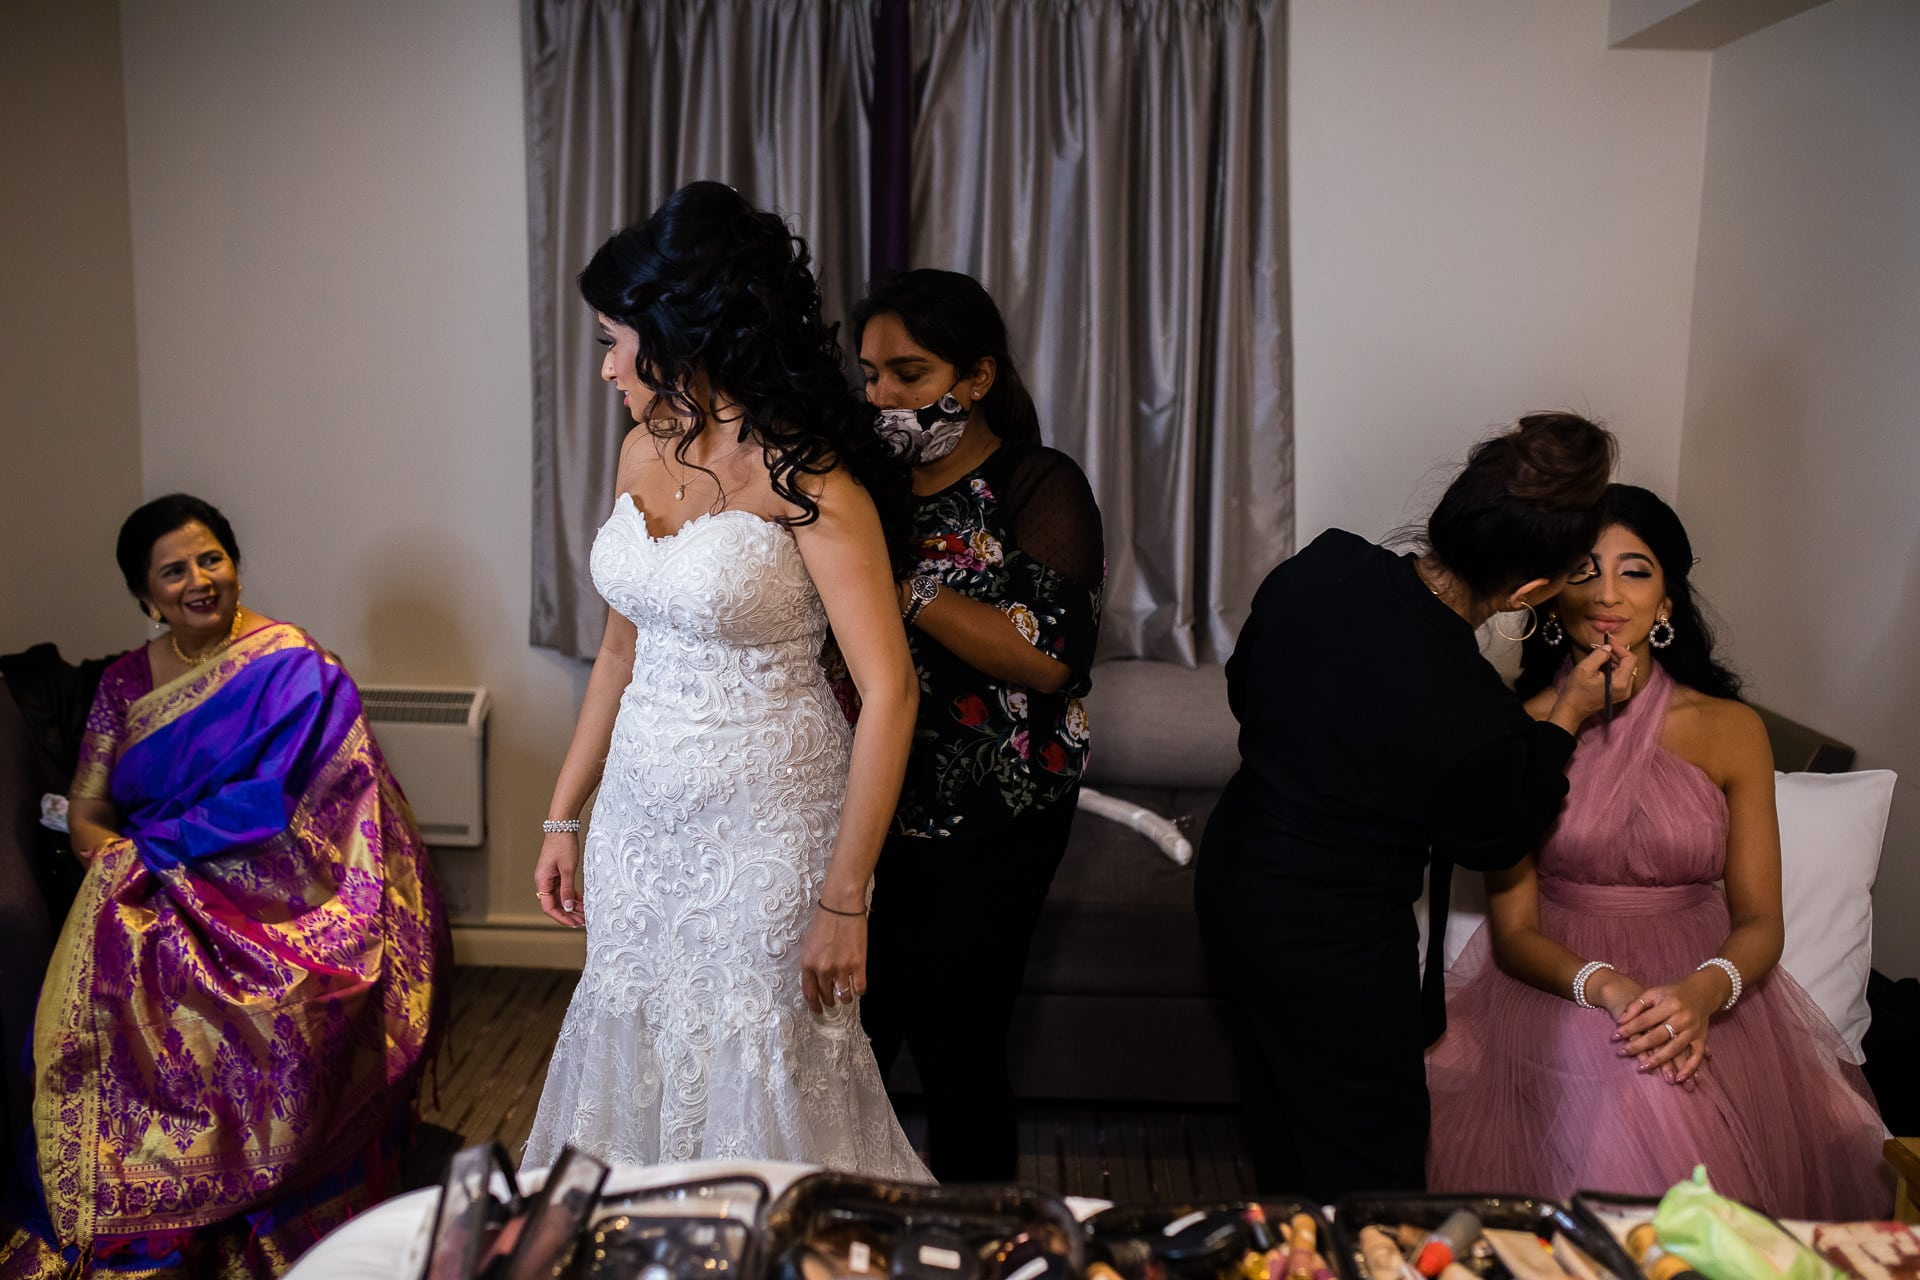 Best Asian wedding photographs of 2020